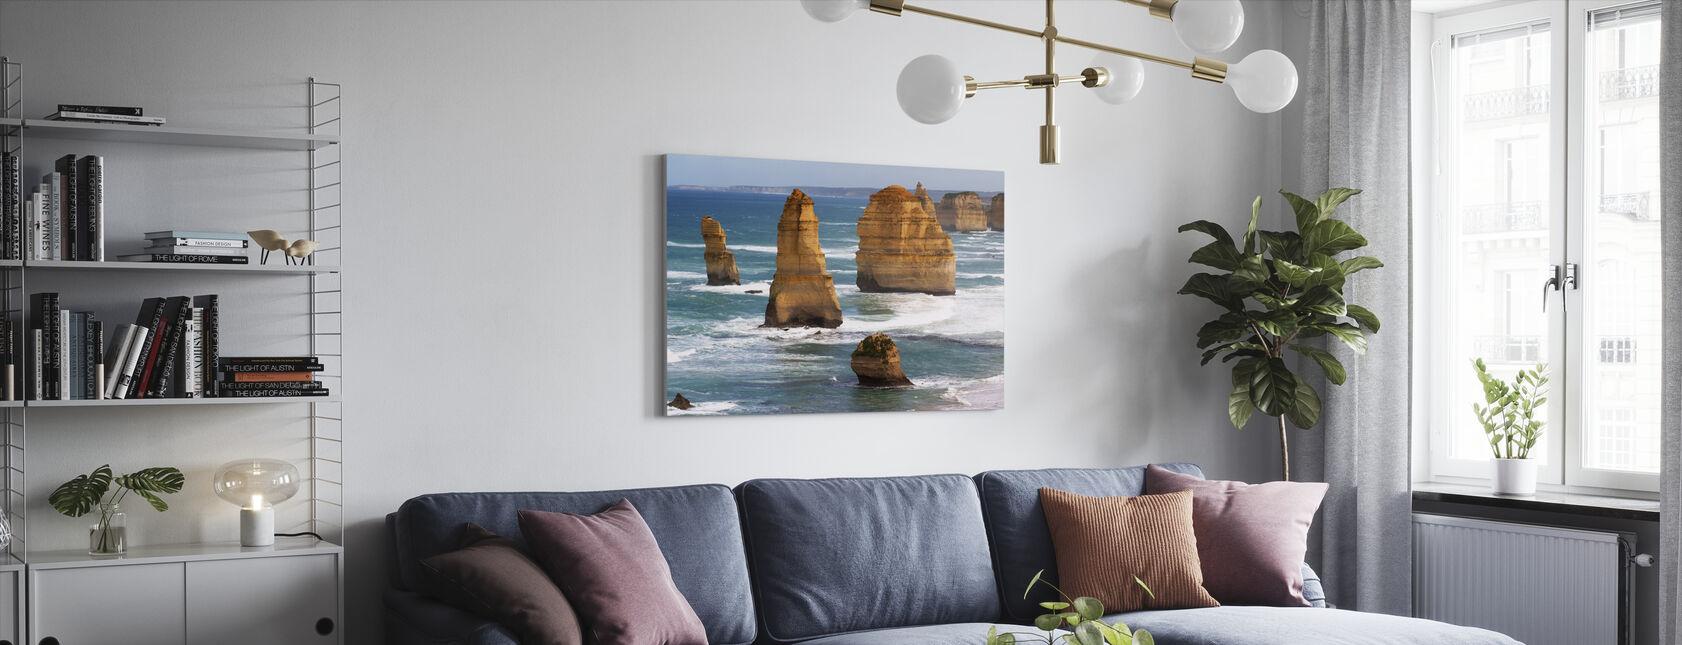 12 Apostels - Canvas print - Living Room